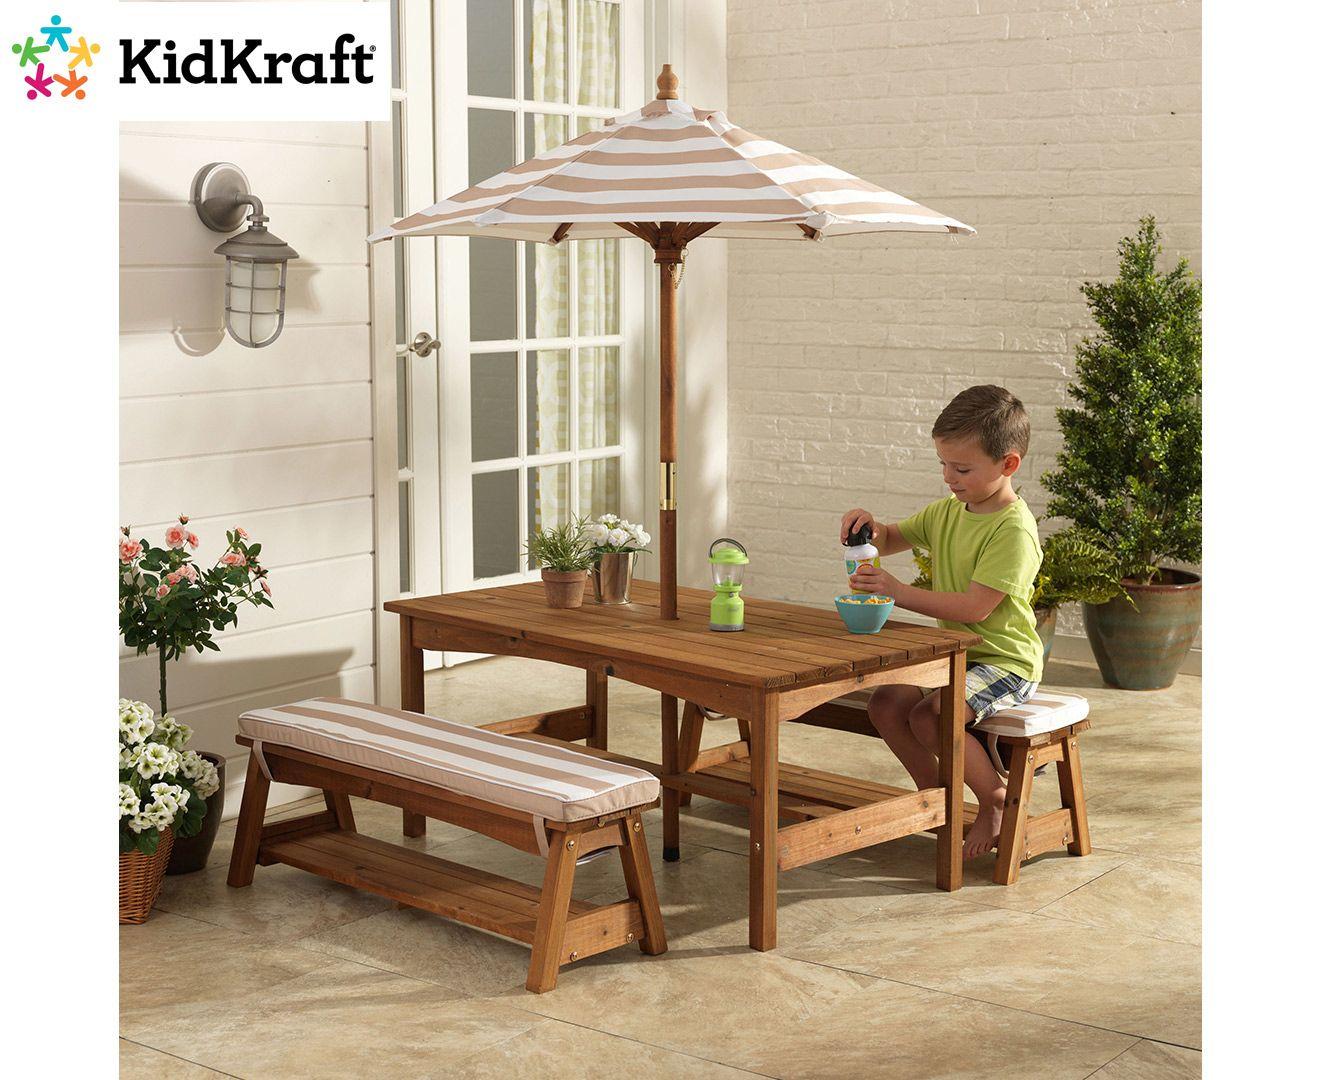 Kidkraft Outdoor Table Bench Set Oatmeal White Kids Outdoor